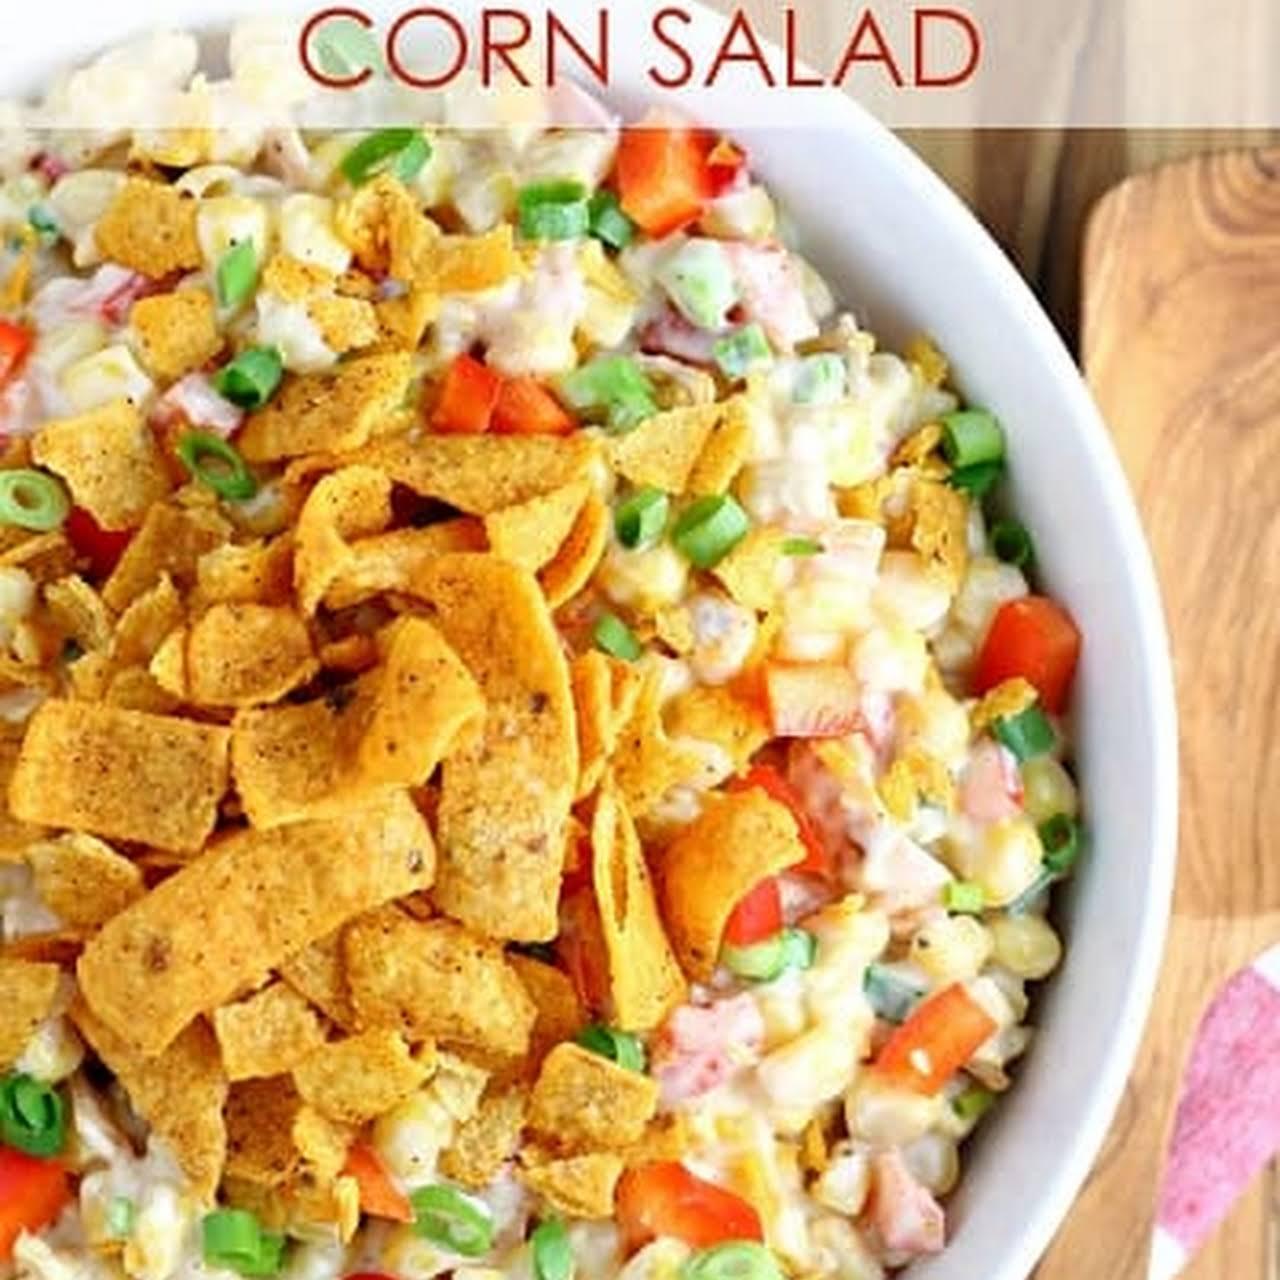 Corn Salad Recipe With Mayo And Fritos